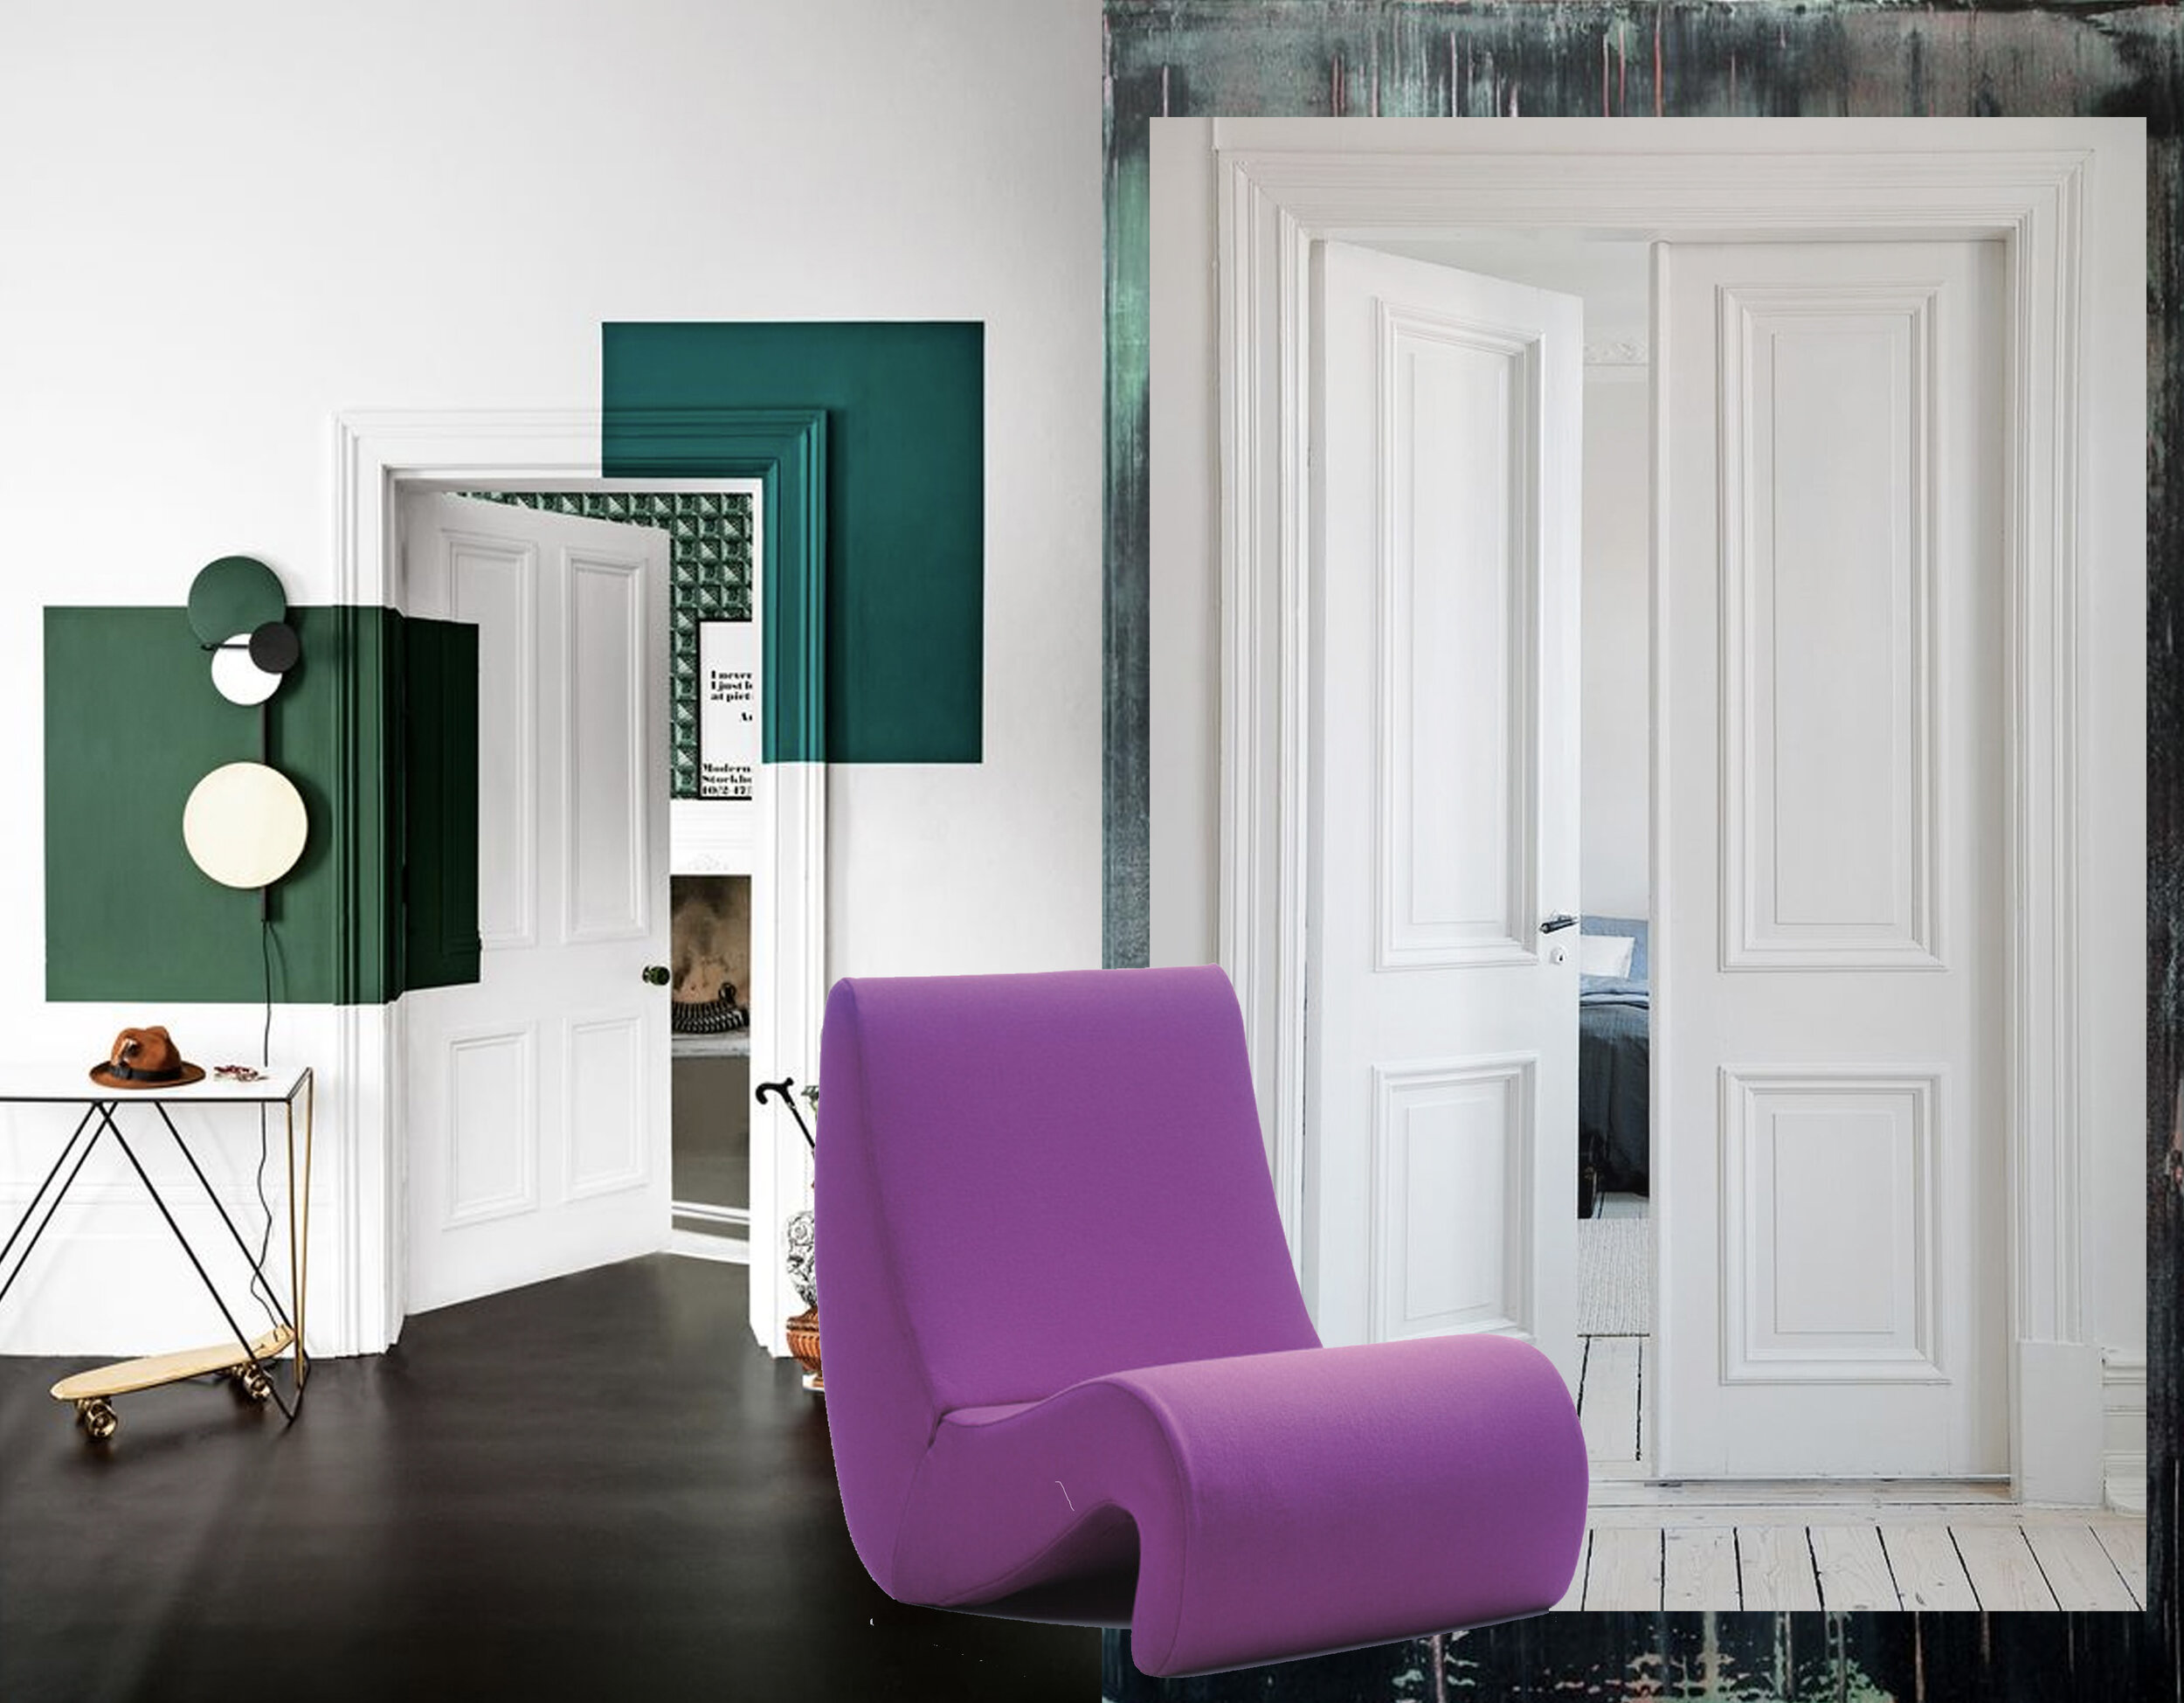 interior on the left  Living etc  - white door via  Ombia  - green background via  WGSN  - armchair Amoebe, Verner Panton  Vitra